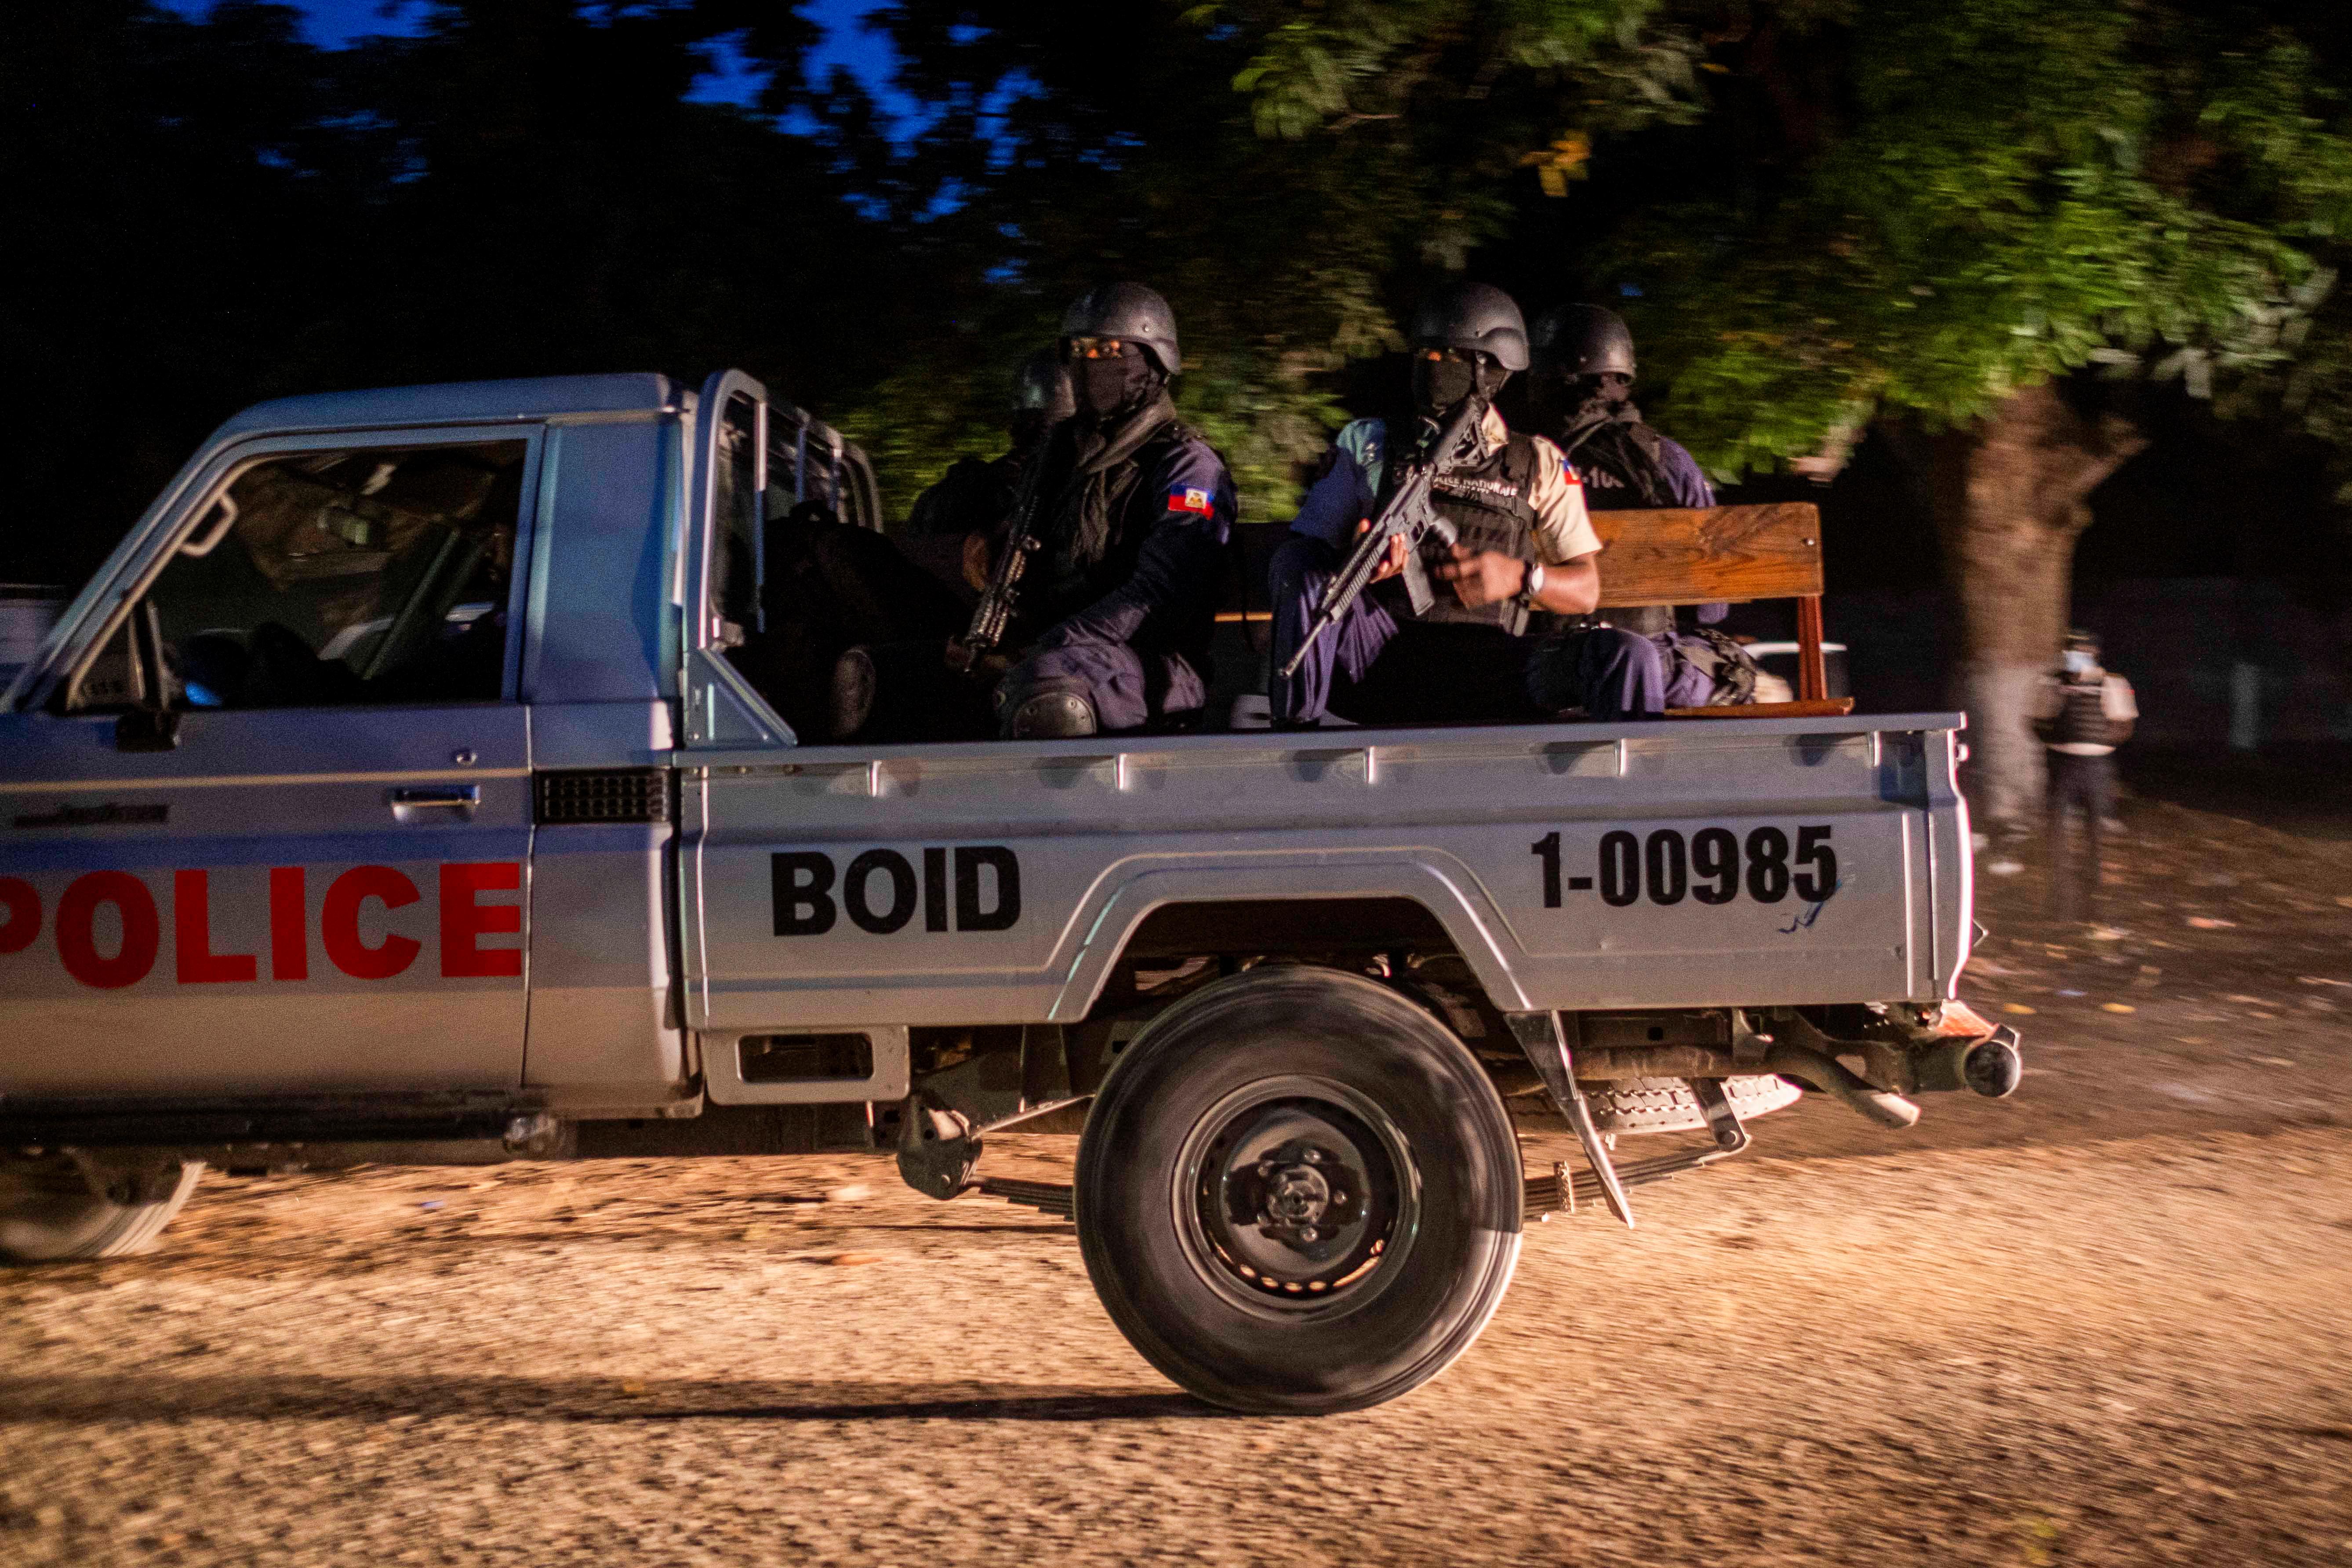 Haitian National Police patrols during the final preparations for funeral of slain Haitian President Jovenel Moise in Cap-Haitien, Haiti, July 23, 2021. REUTERS/Ricardo Arduengo